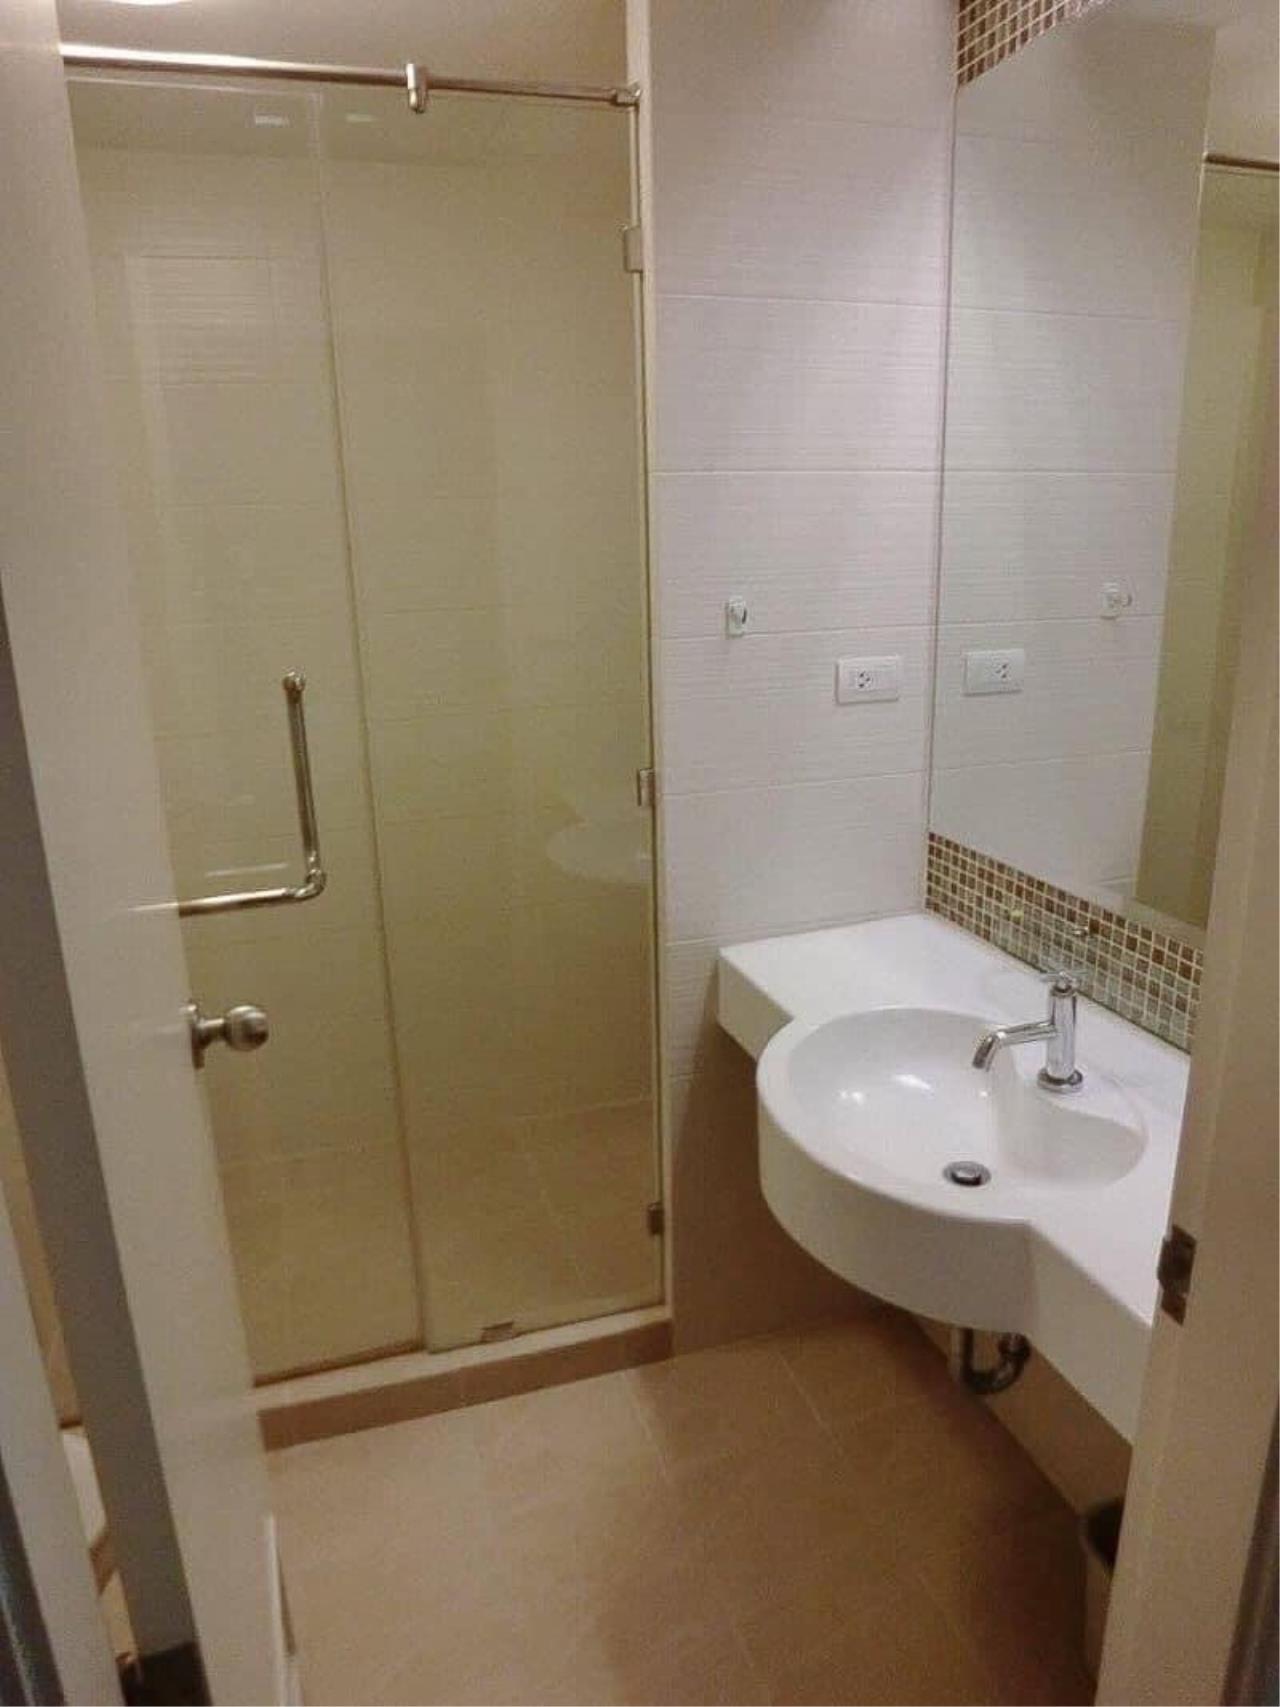 Agent - Phapayawarin Agency's Centric Scene Ratchavipha for Sale, 2 Bedroom 2 Bathroom, 75 Sq.m. 10